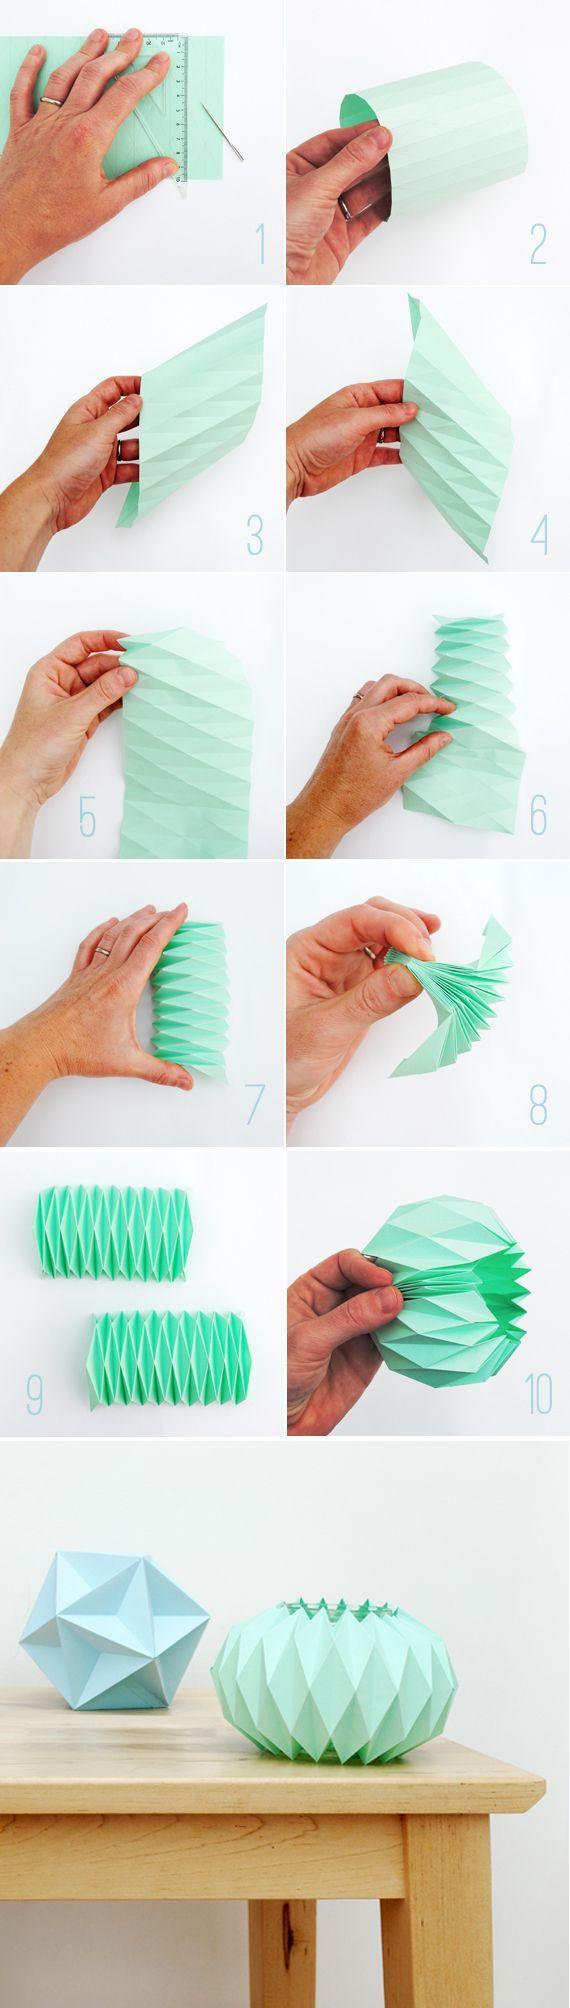 DIY Accordion paper folding candle holder diy crafts | Home Decor Park